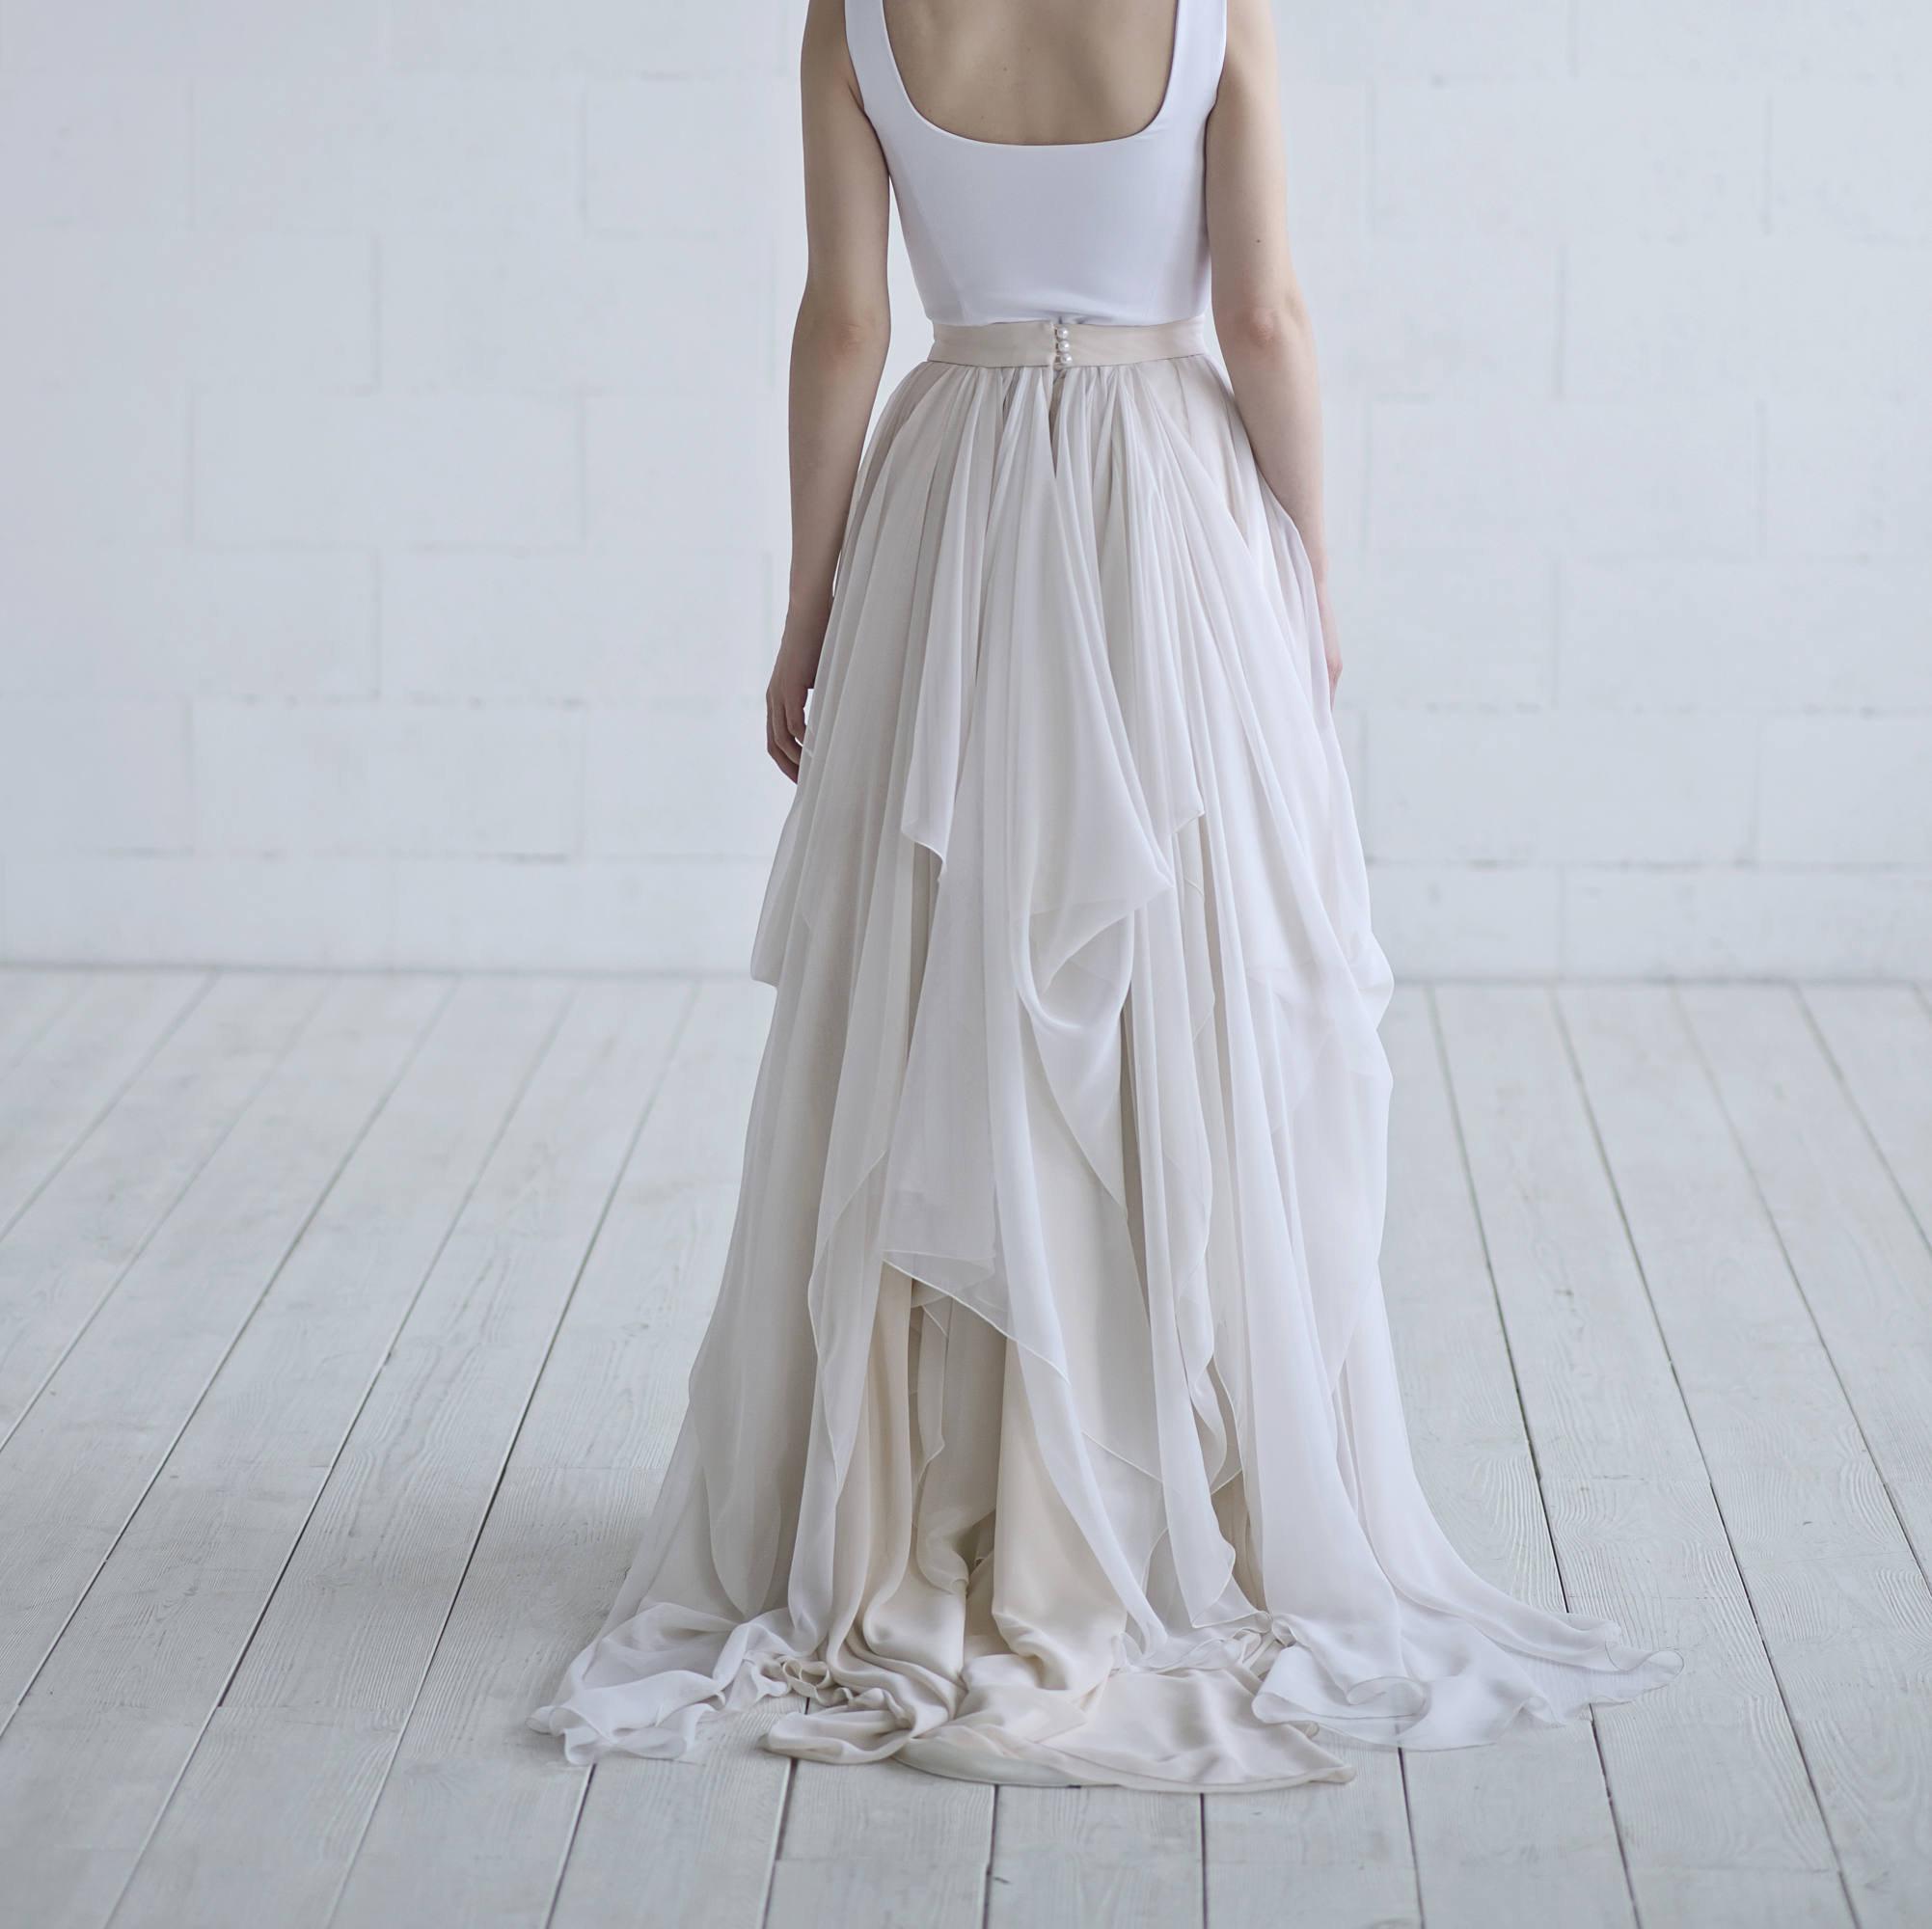 Maegan chiffon bridal skirt / lightweight bridal skirt /